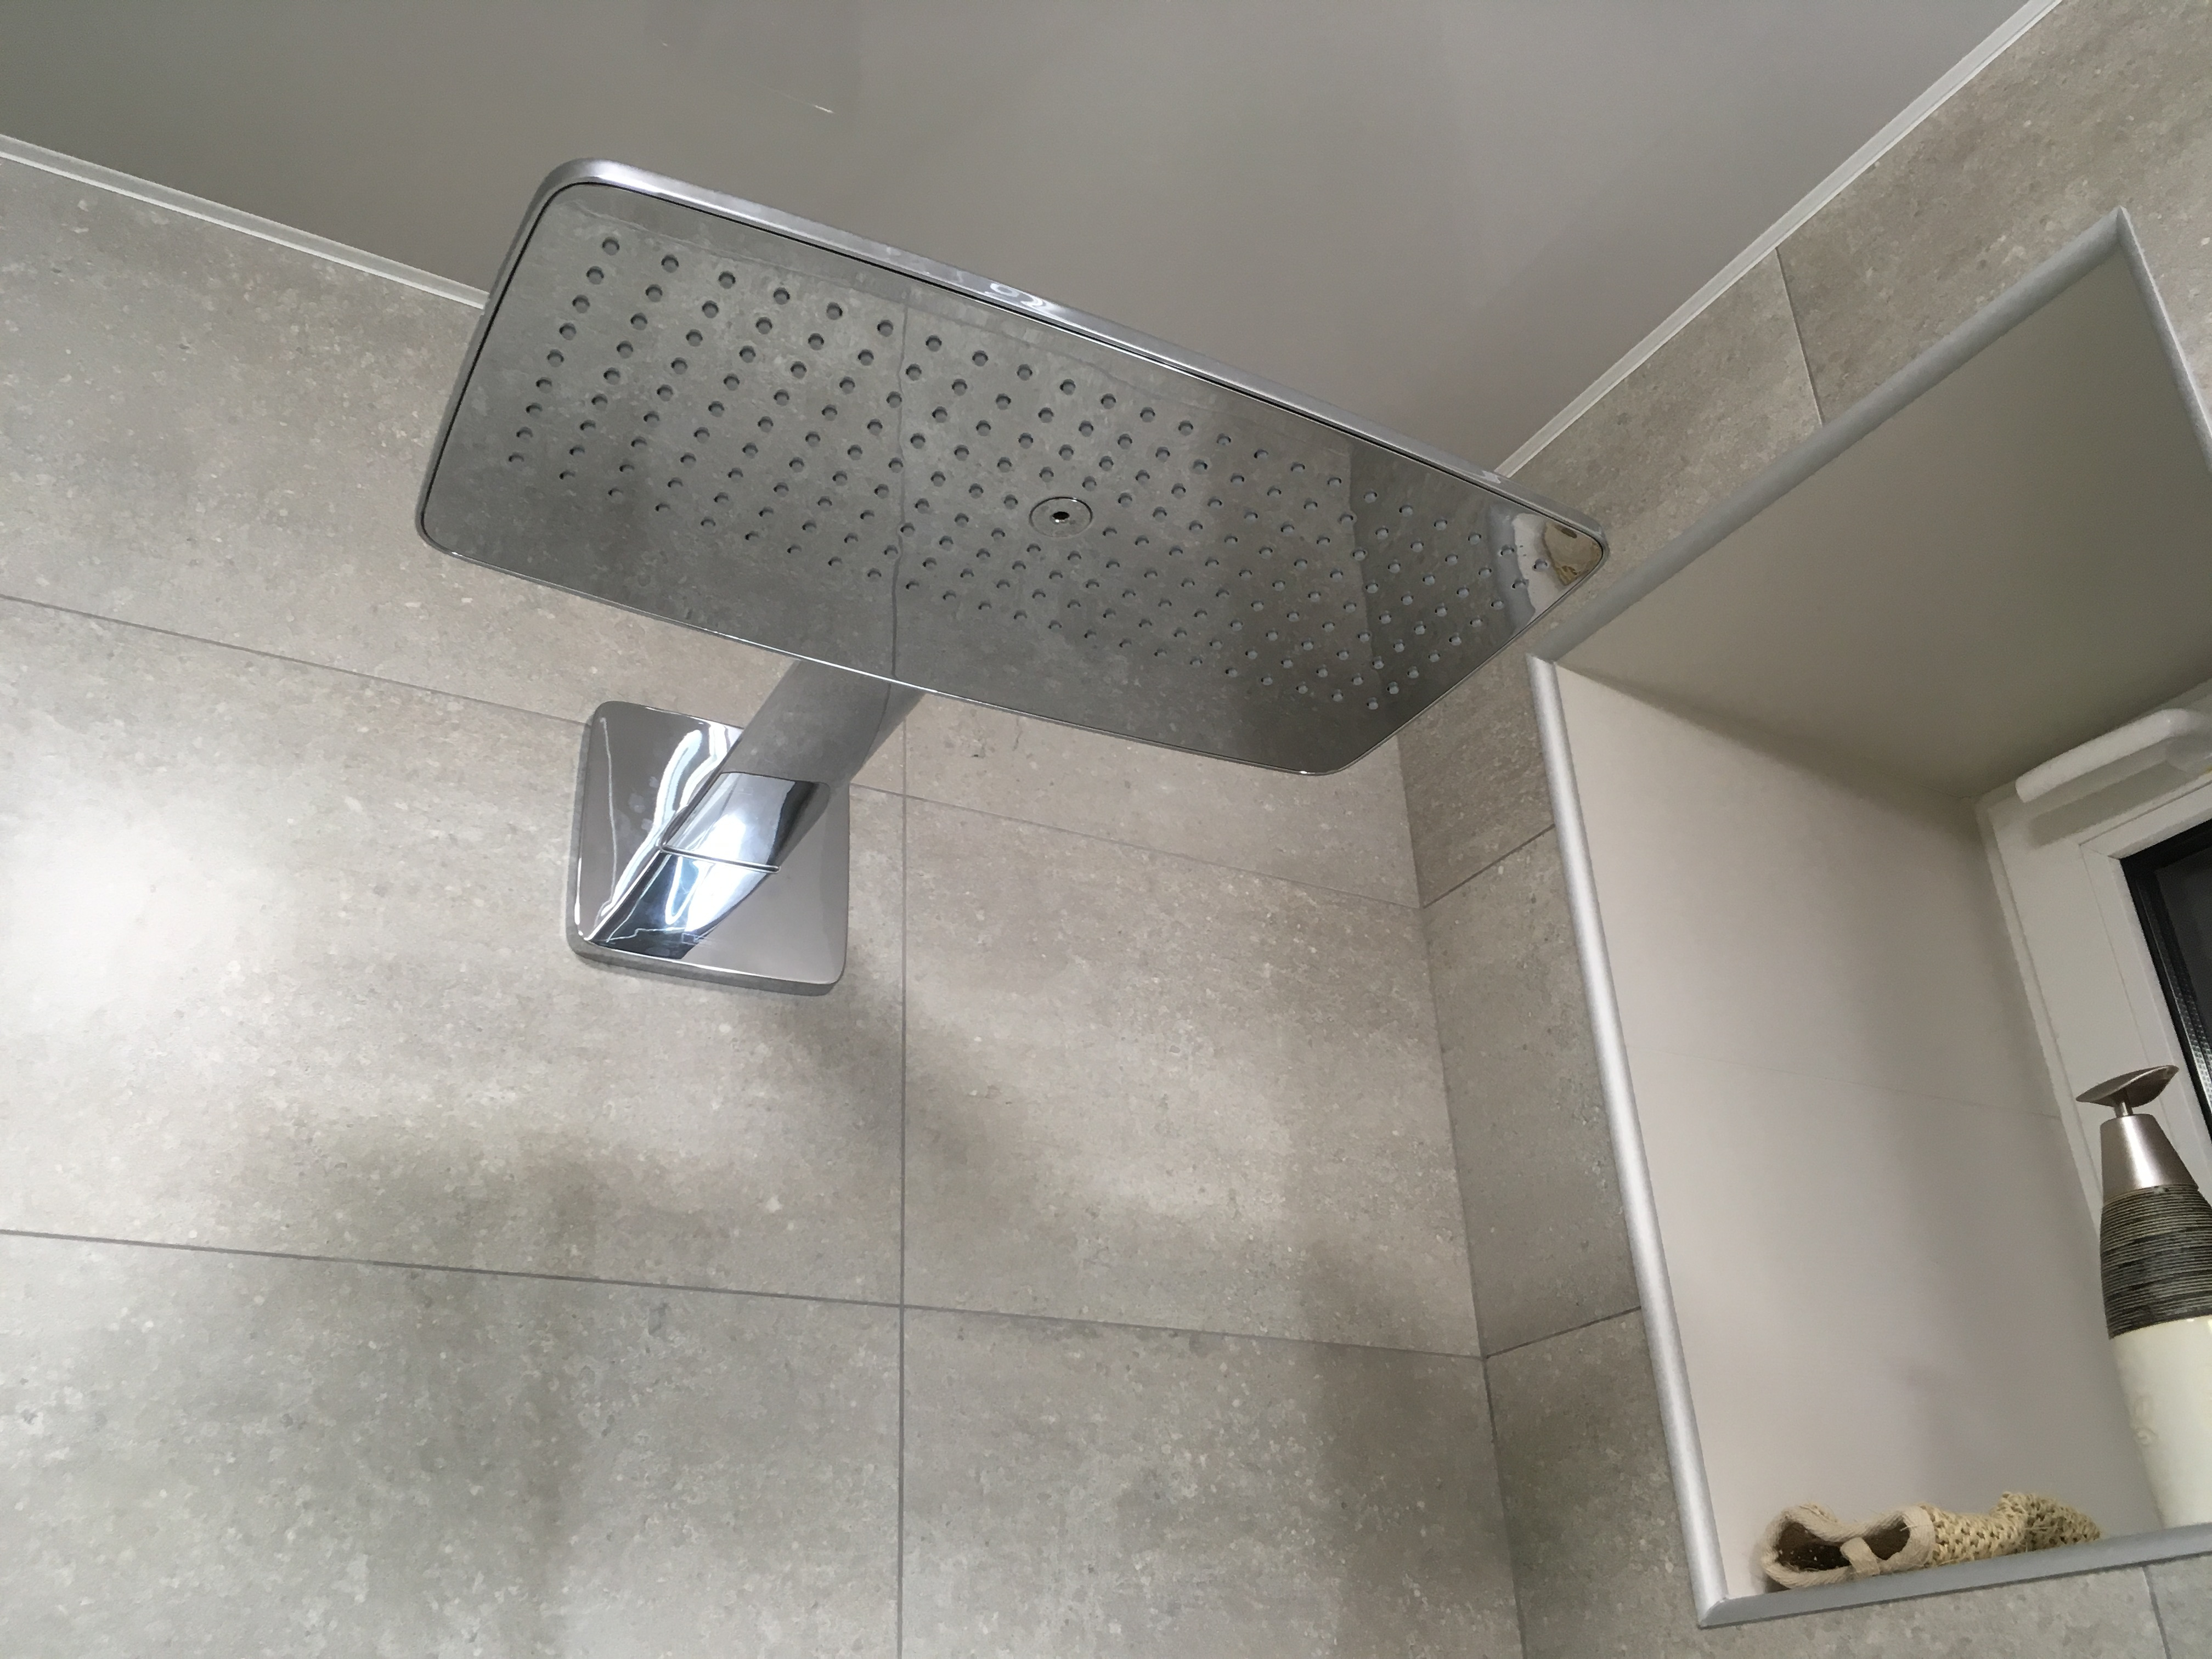 Сантехника под ключ в квартире - Systems Engineering - photo 16